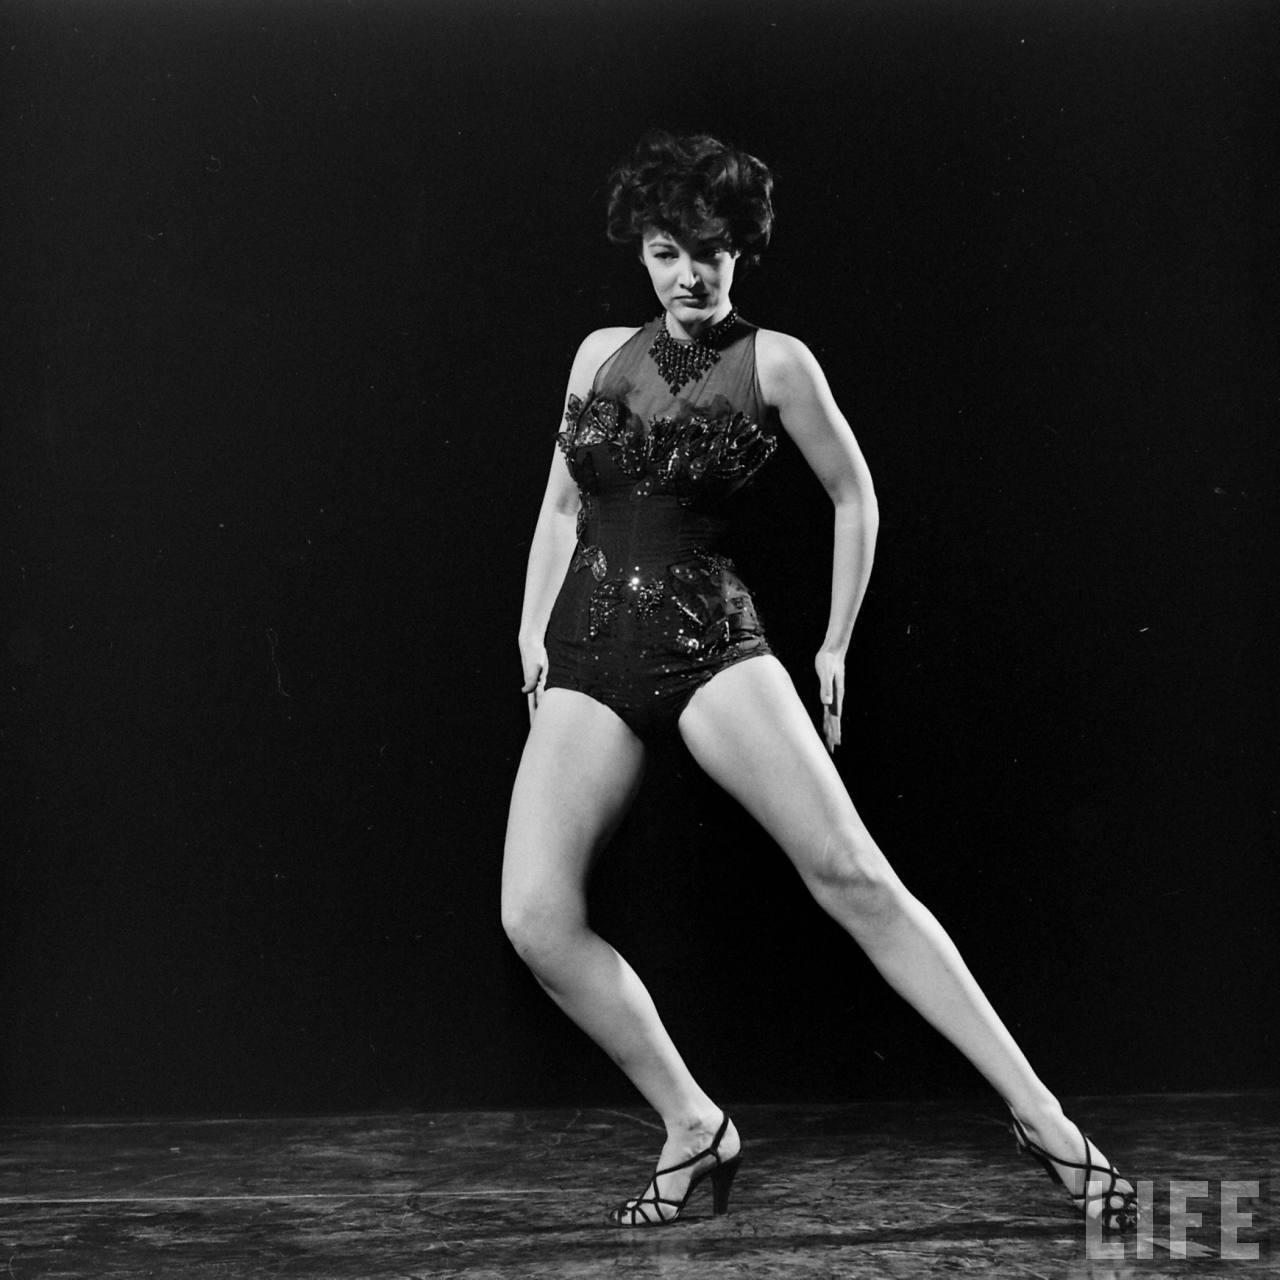 Julie White,Sunday Wilshin Erotic pics & movies Paule Baillargeon,Richard Beckinsale (1947?979)